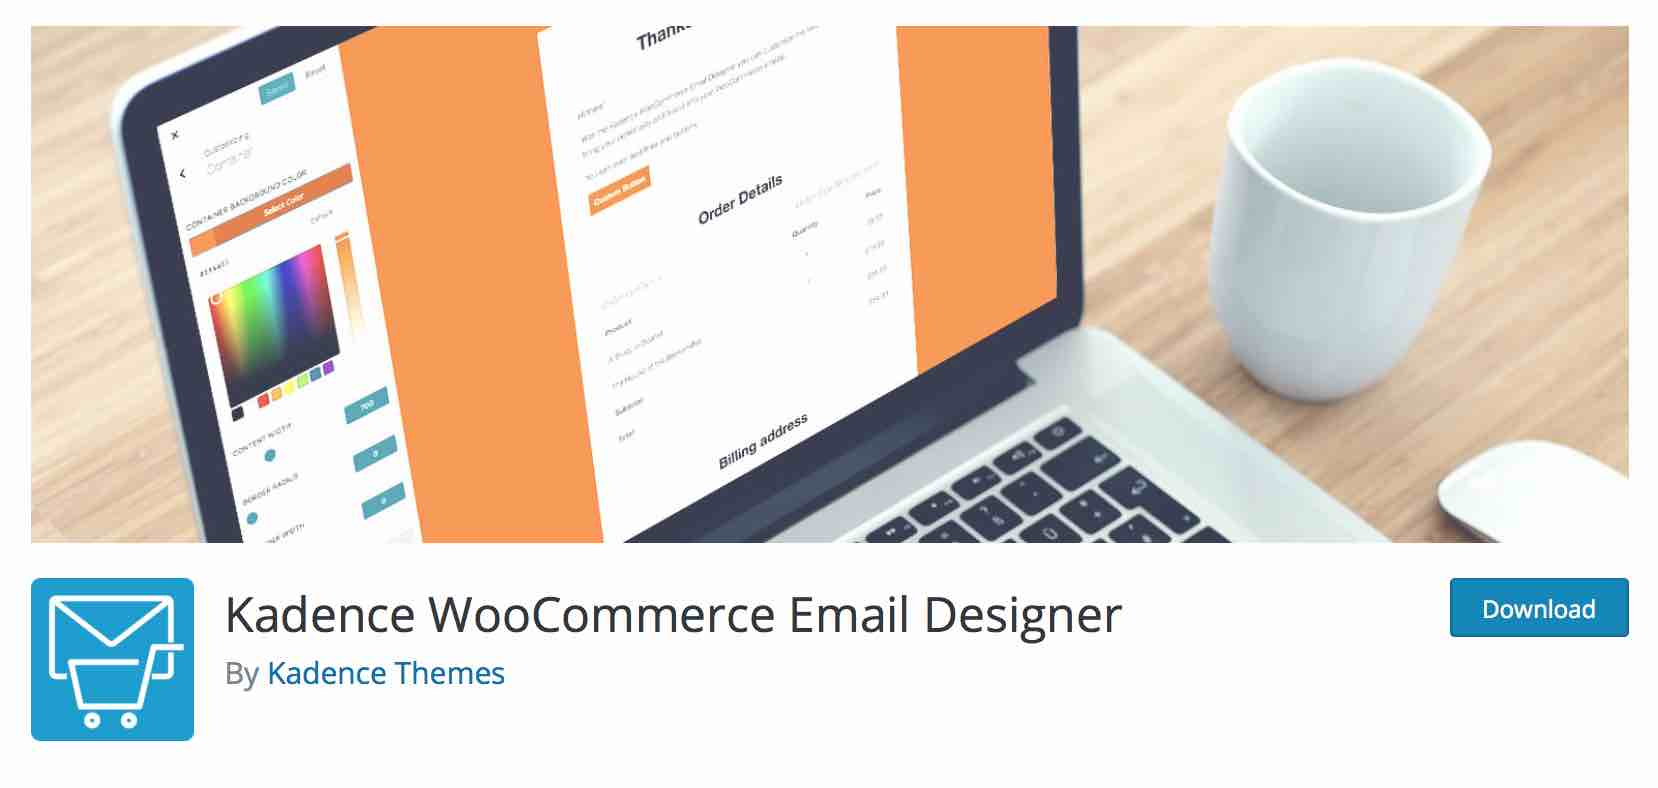 Kadence Email Designer für WooCommerce